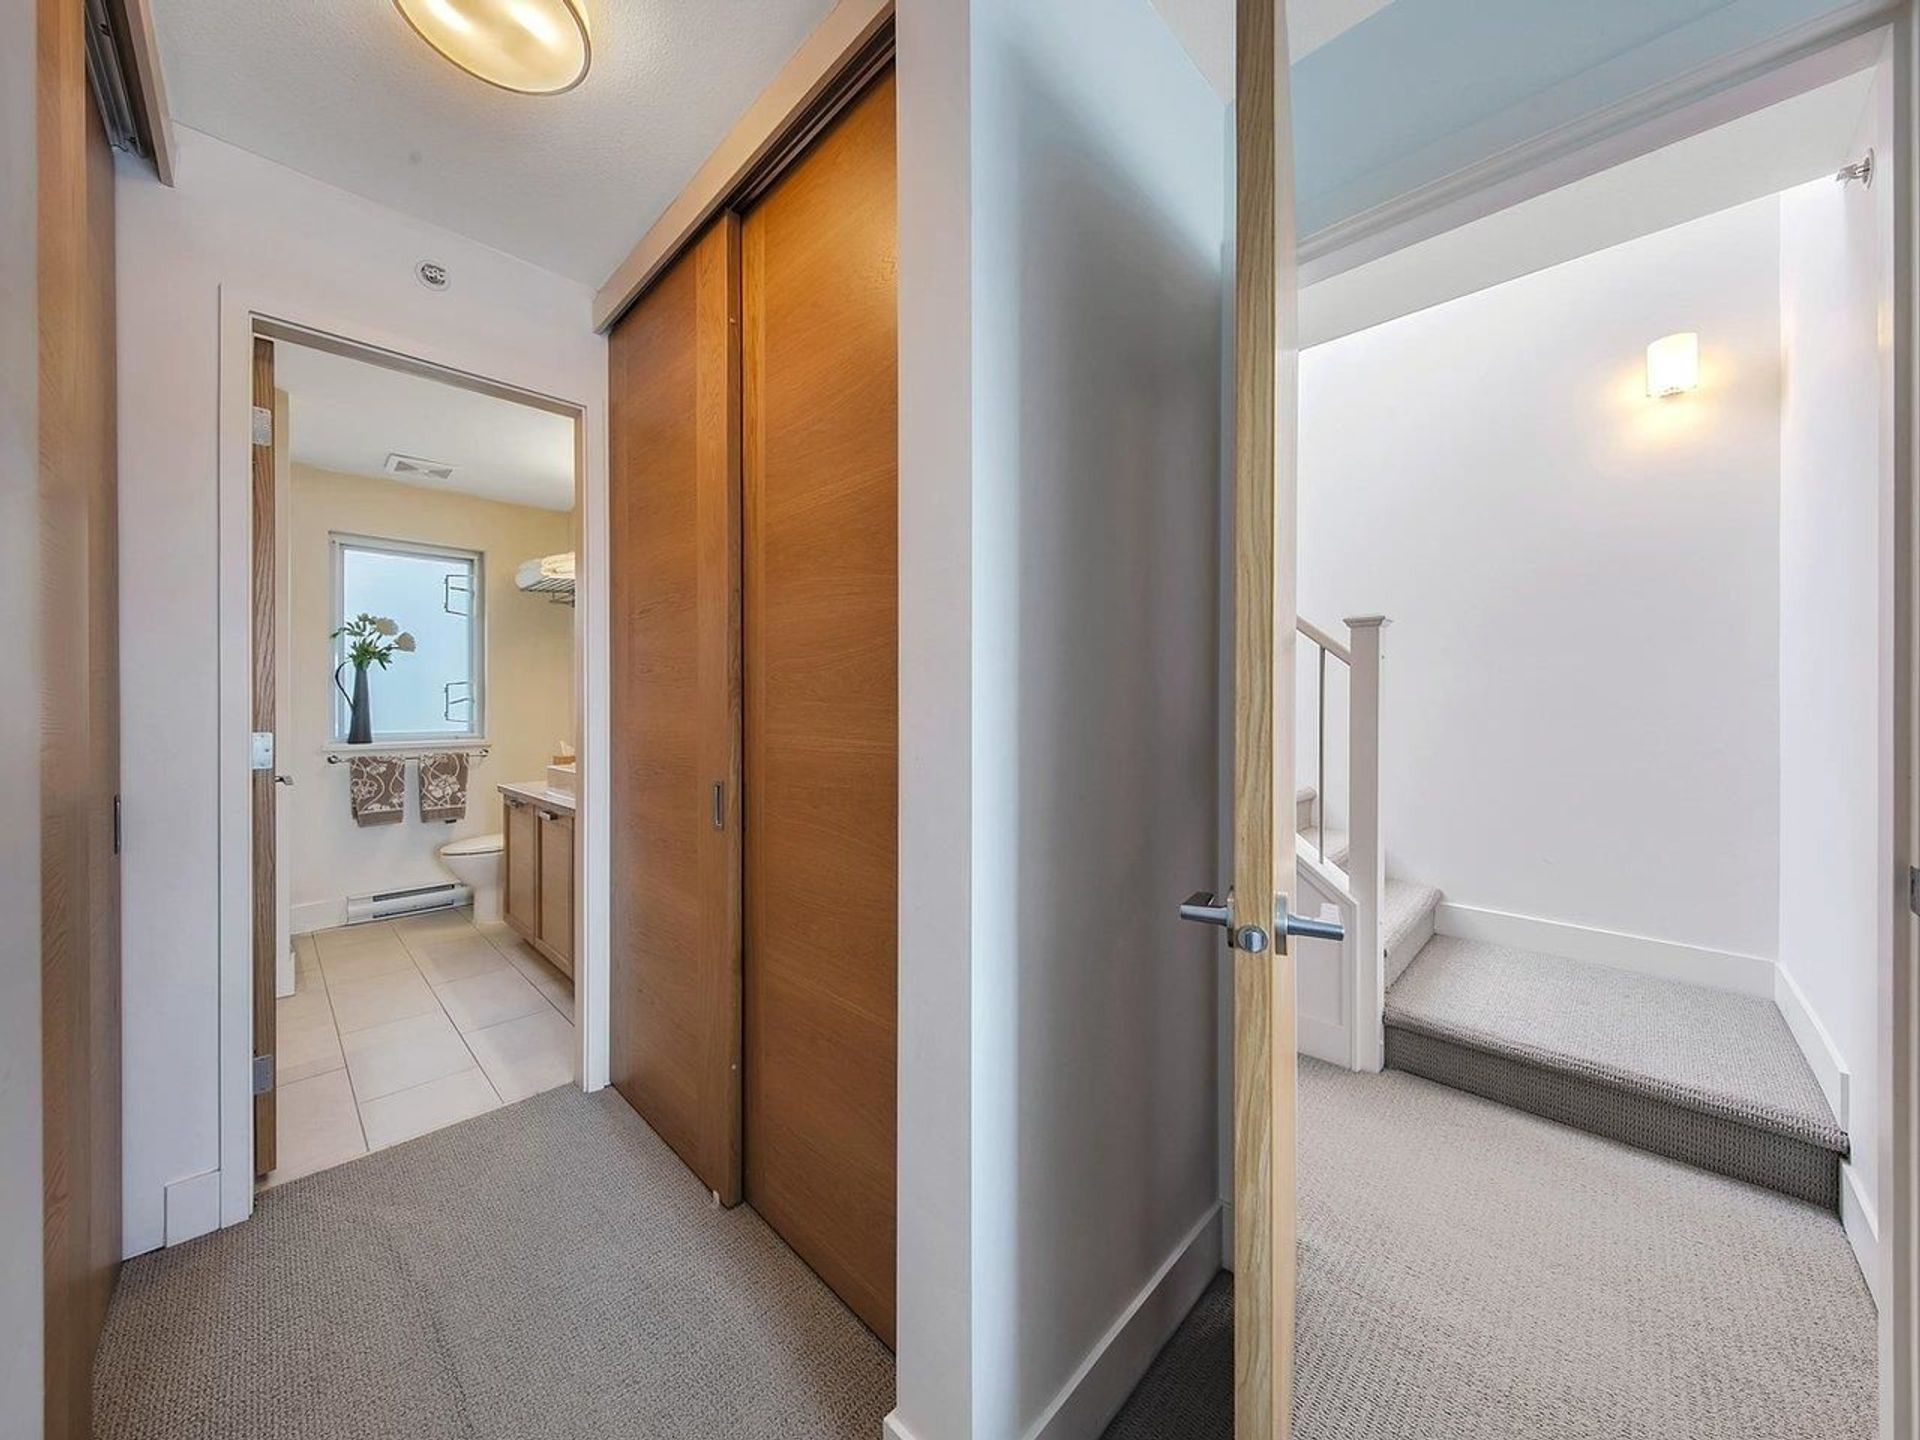 230-salter-street-queensborough-new-westminster-14-1 at 24 - 230 Salter Street, Queensborough, New Westminster